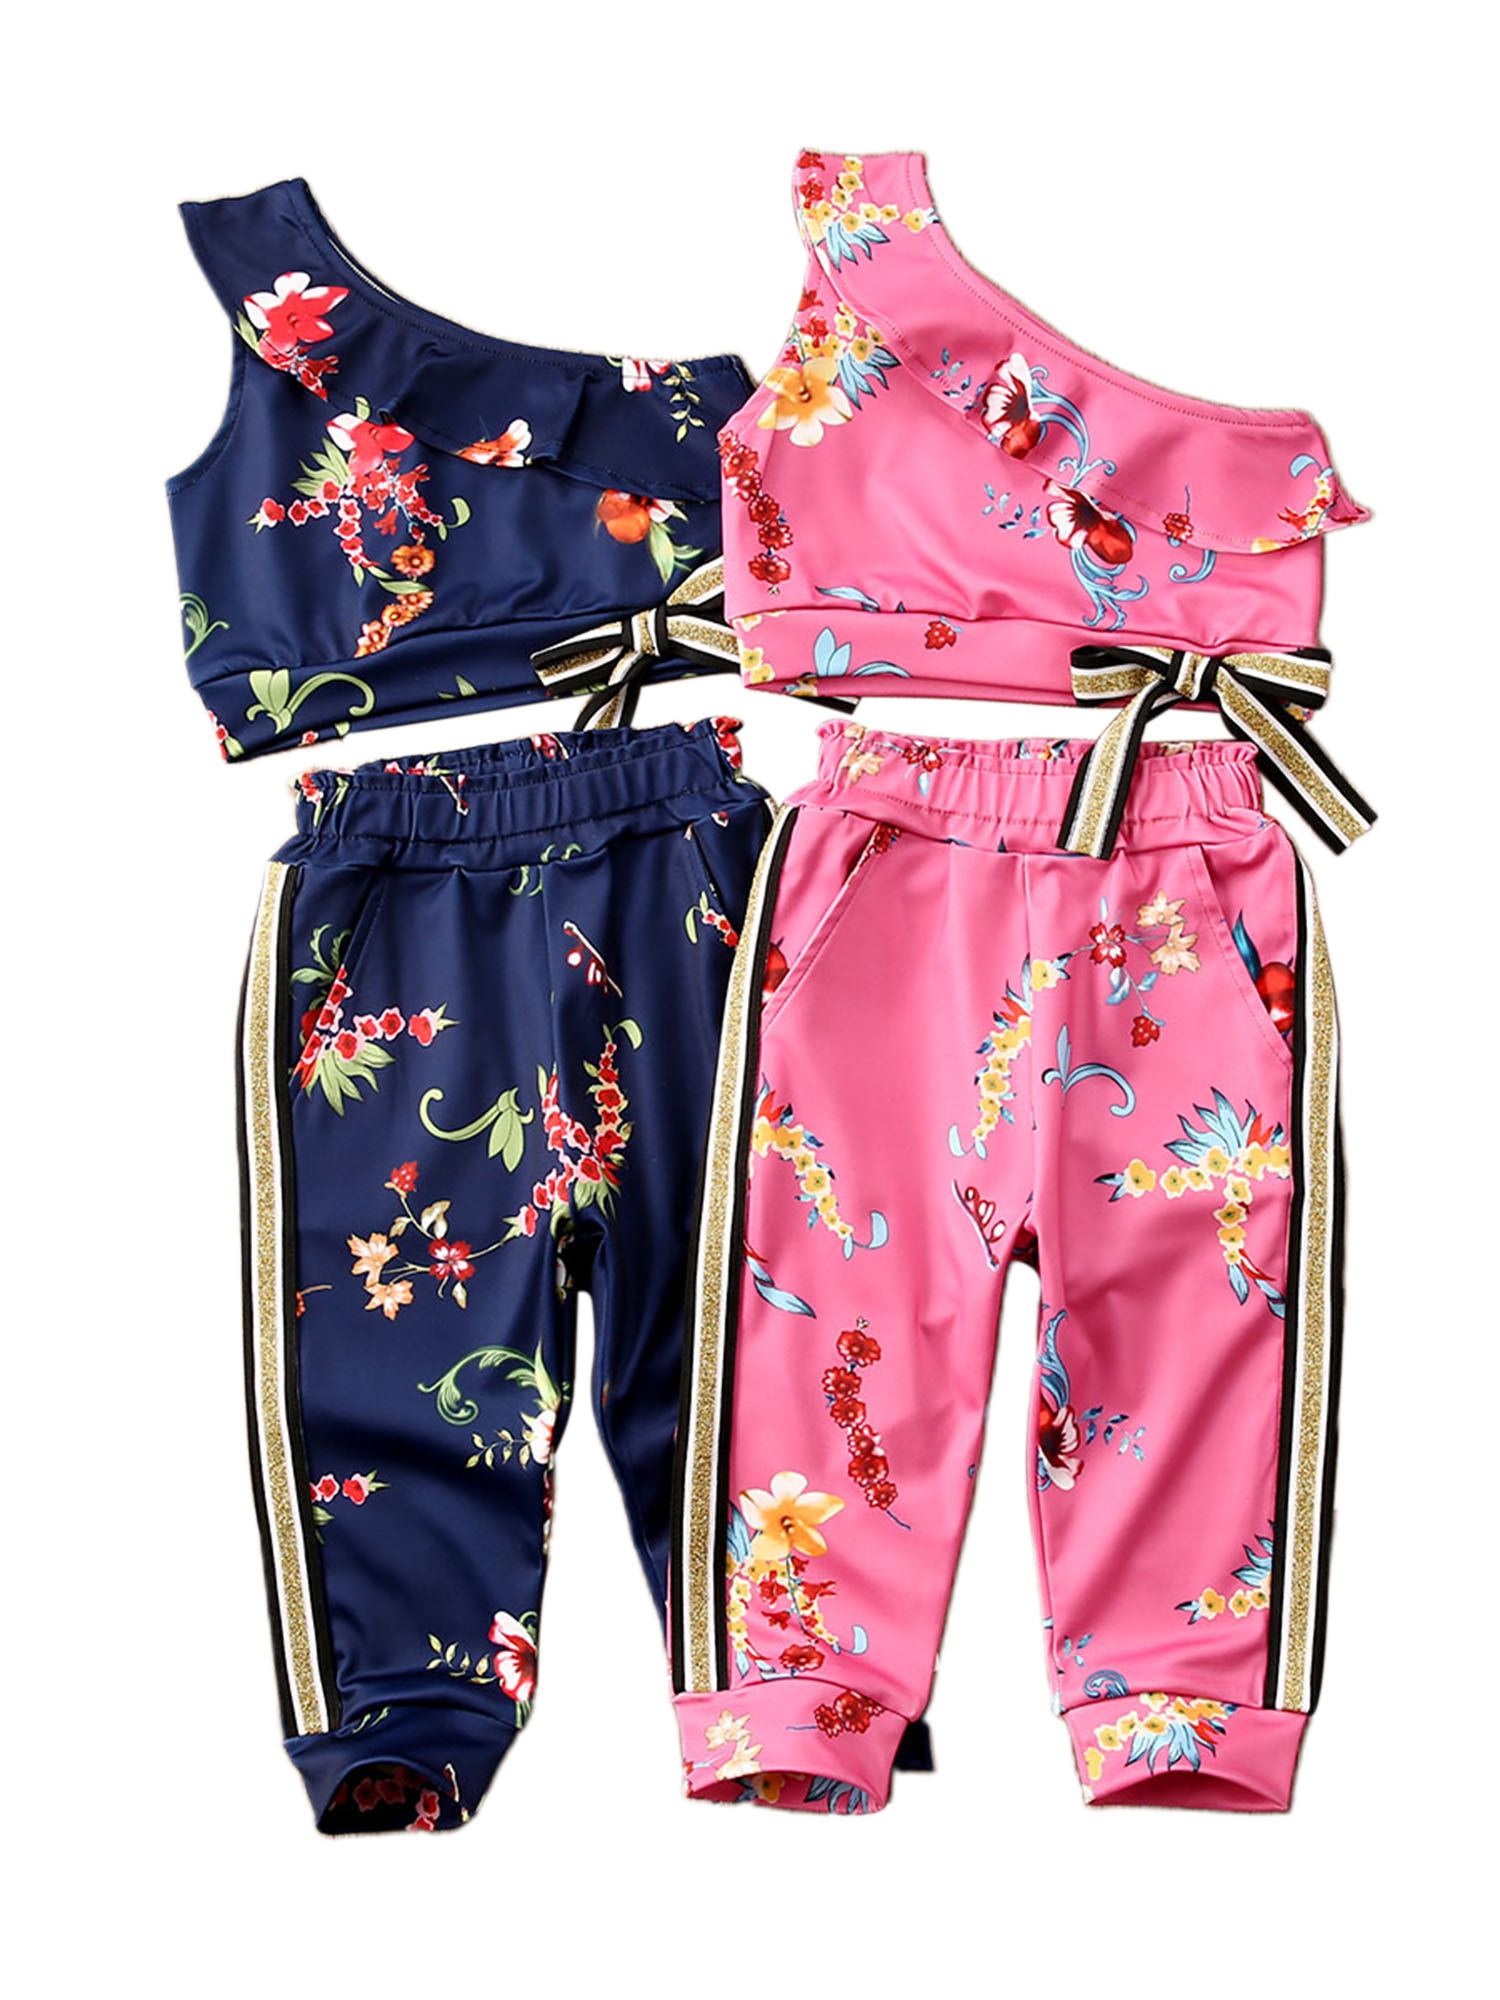 Fashion Infant Baby Girls 1T-6T Clothes Sets Flowers Print One Shoulder Tops+Casual Long Pants 2pcs